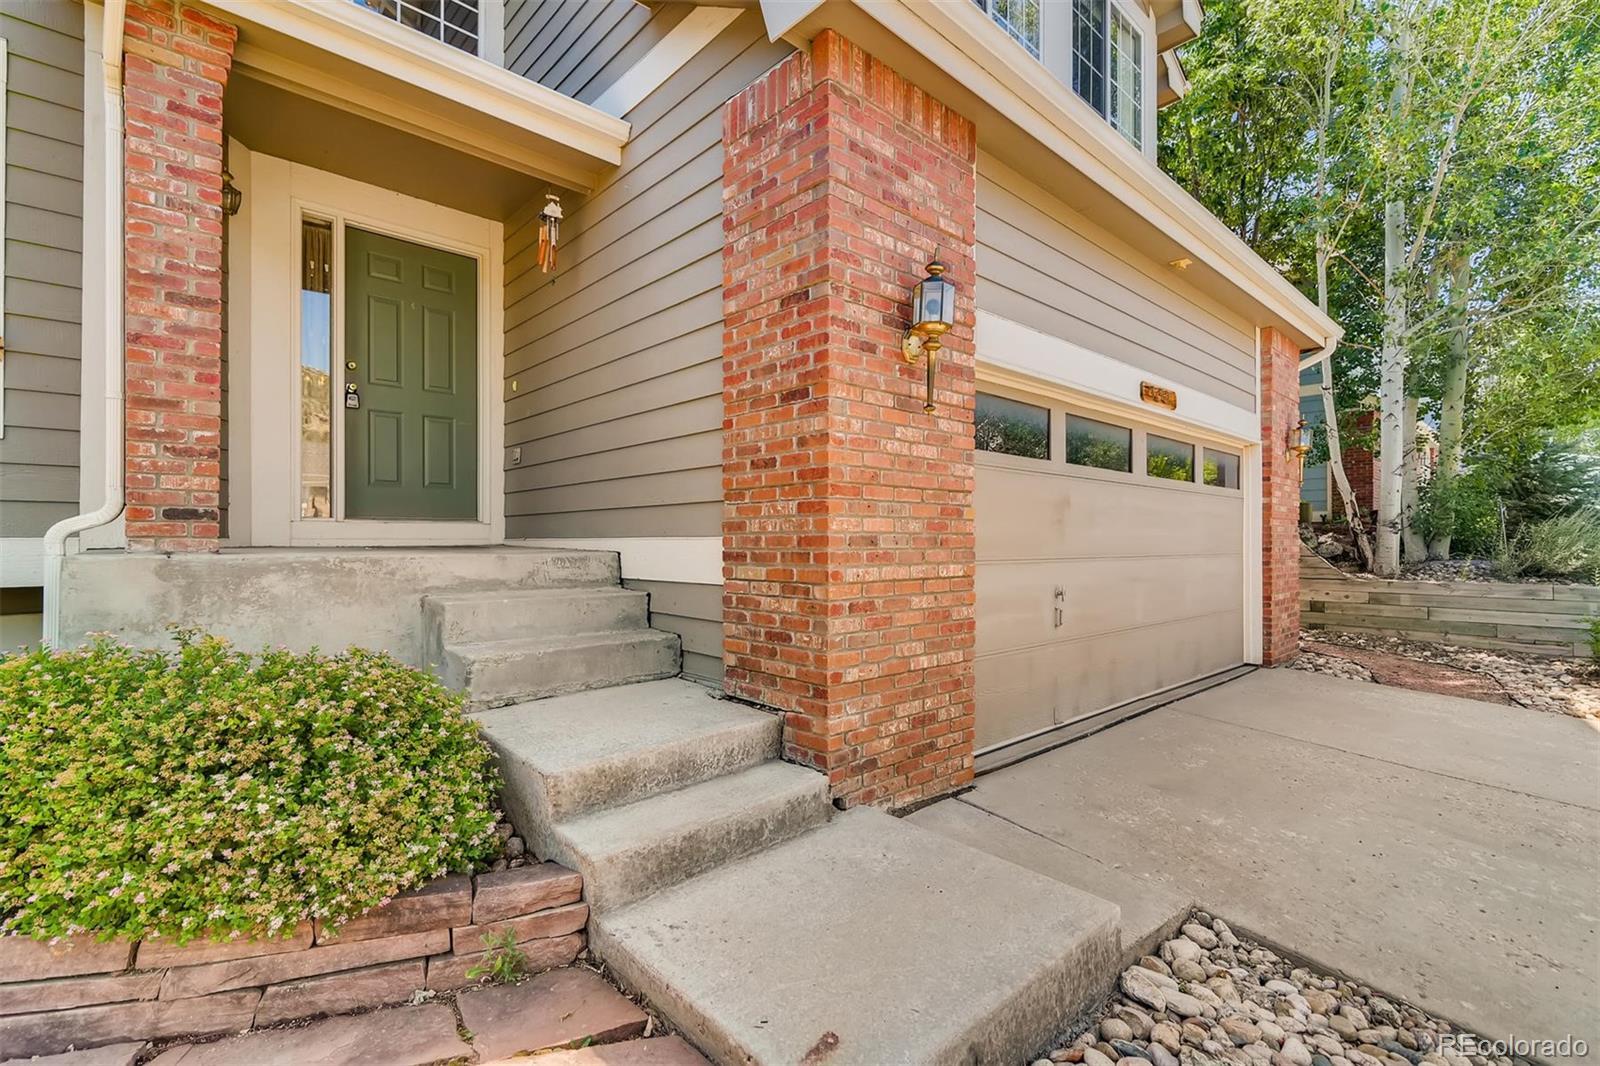 MLS# 9724731 - 5 - 498 Promontory Drive, Loveland, CO 80537